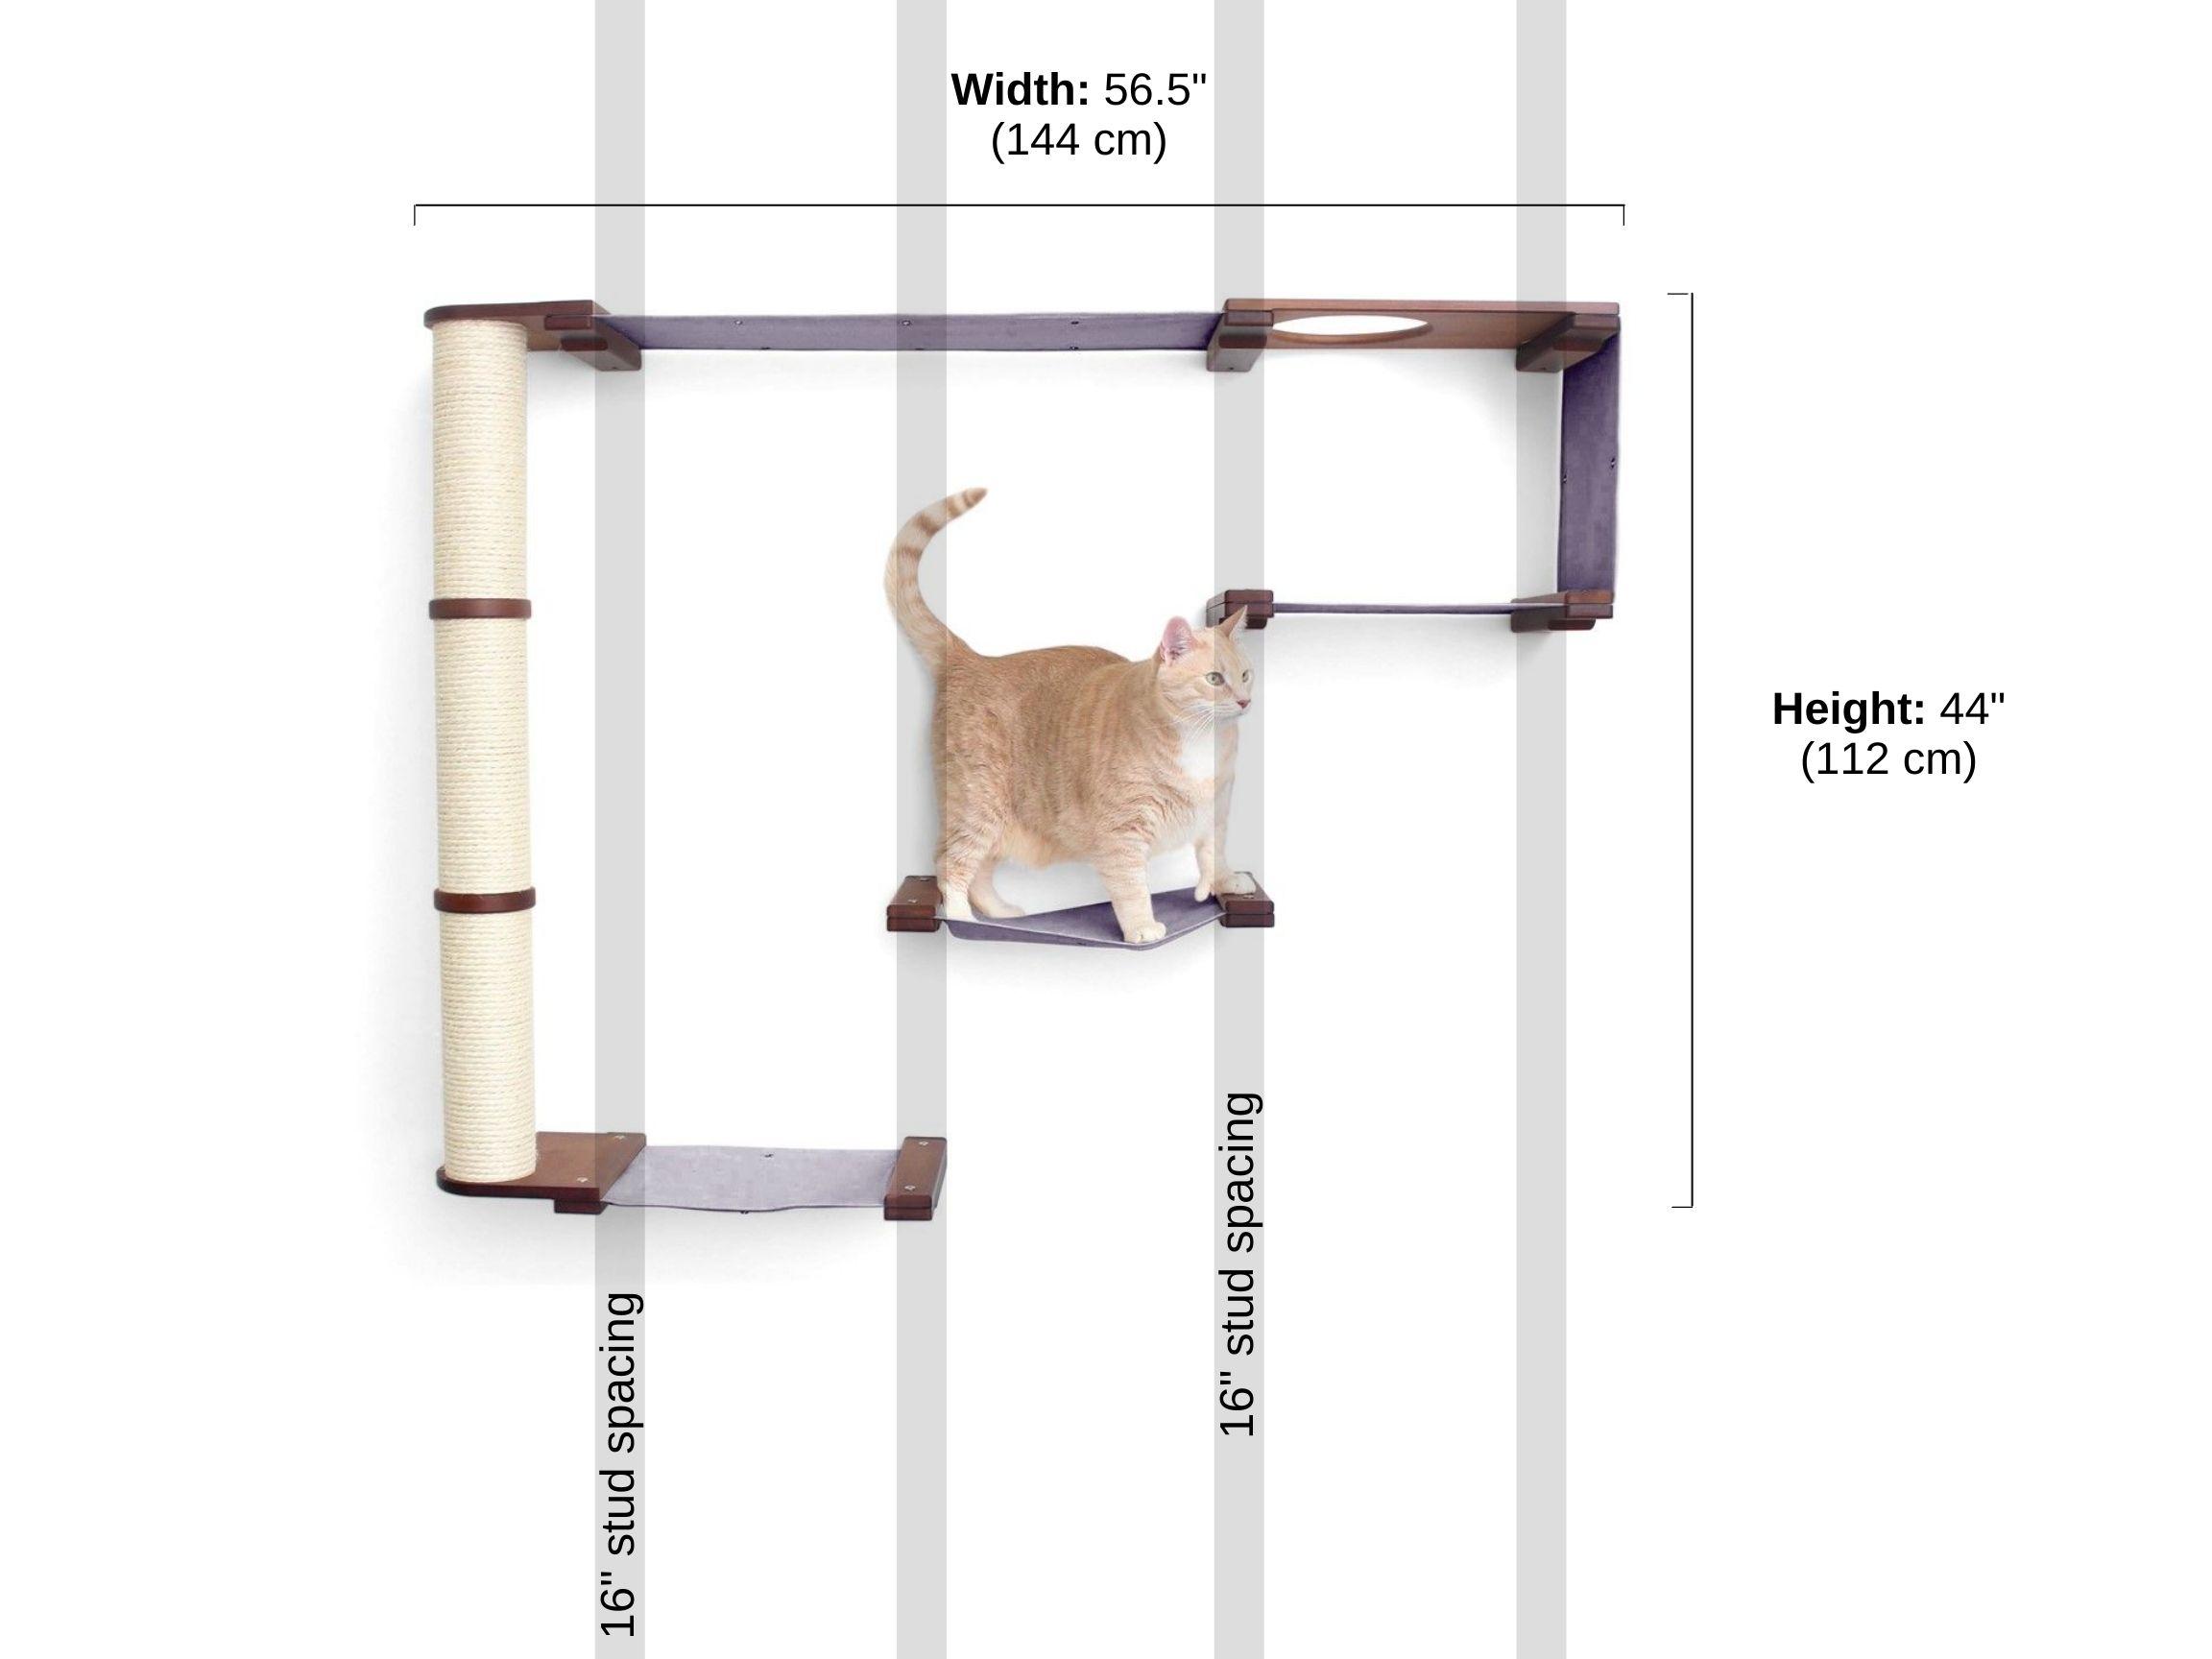 Stud spacing and dimensions of cat climb complex